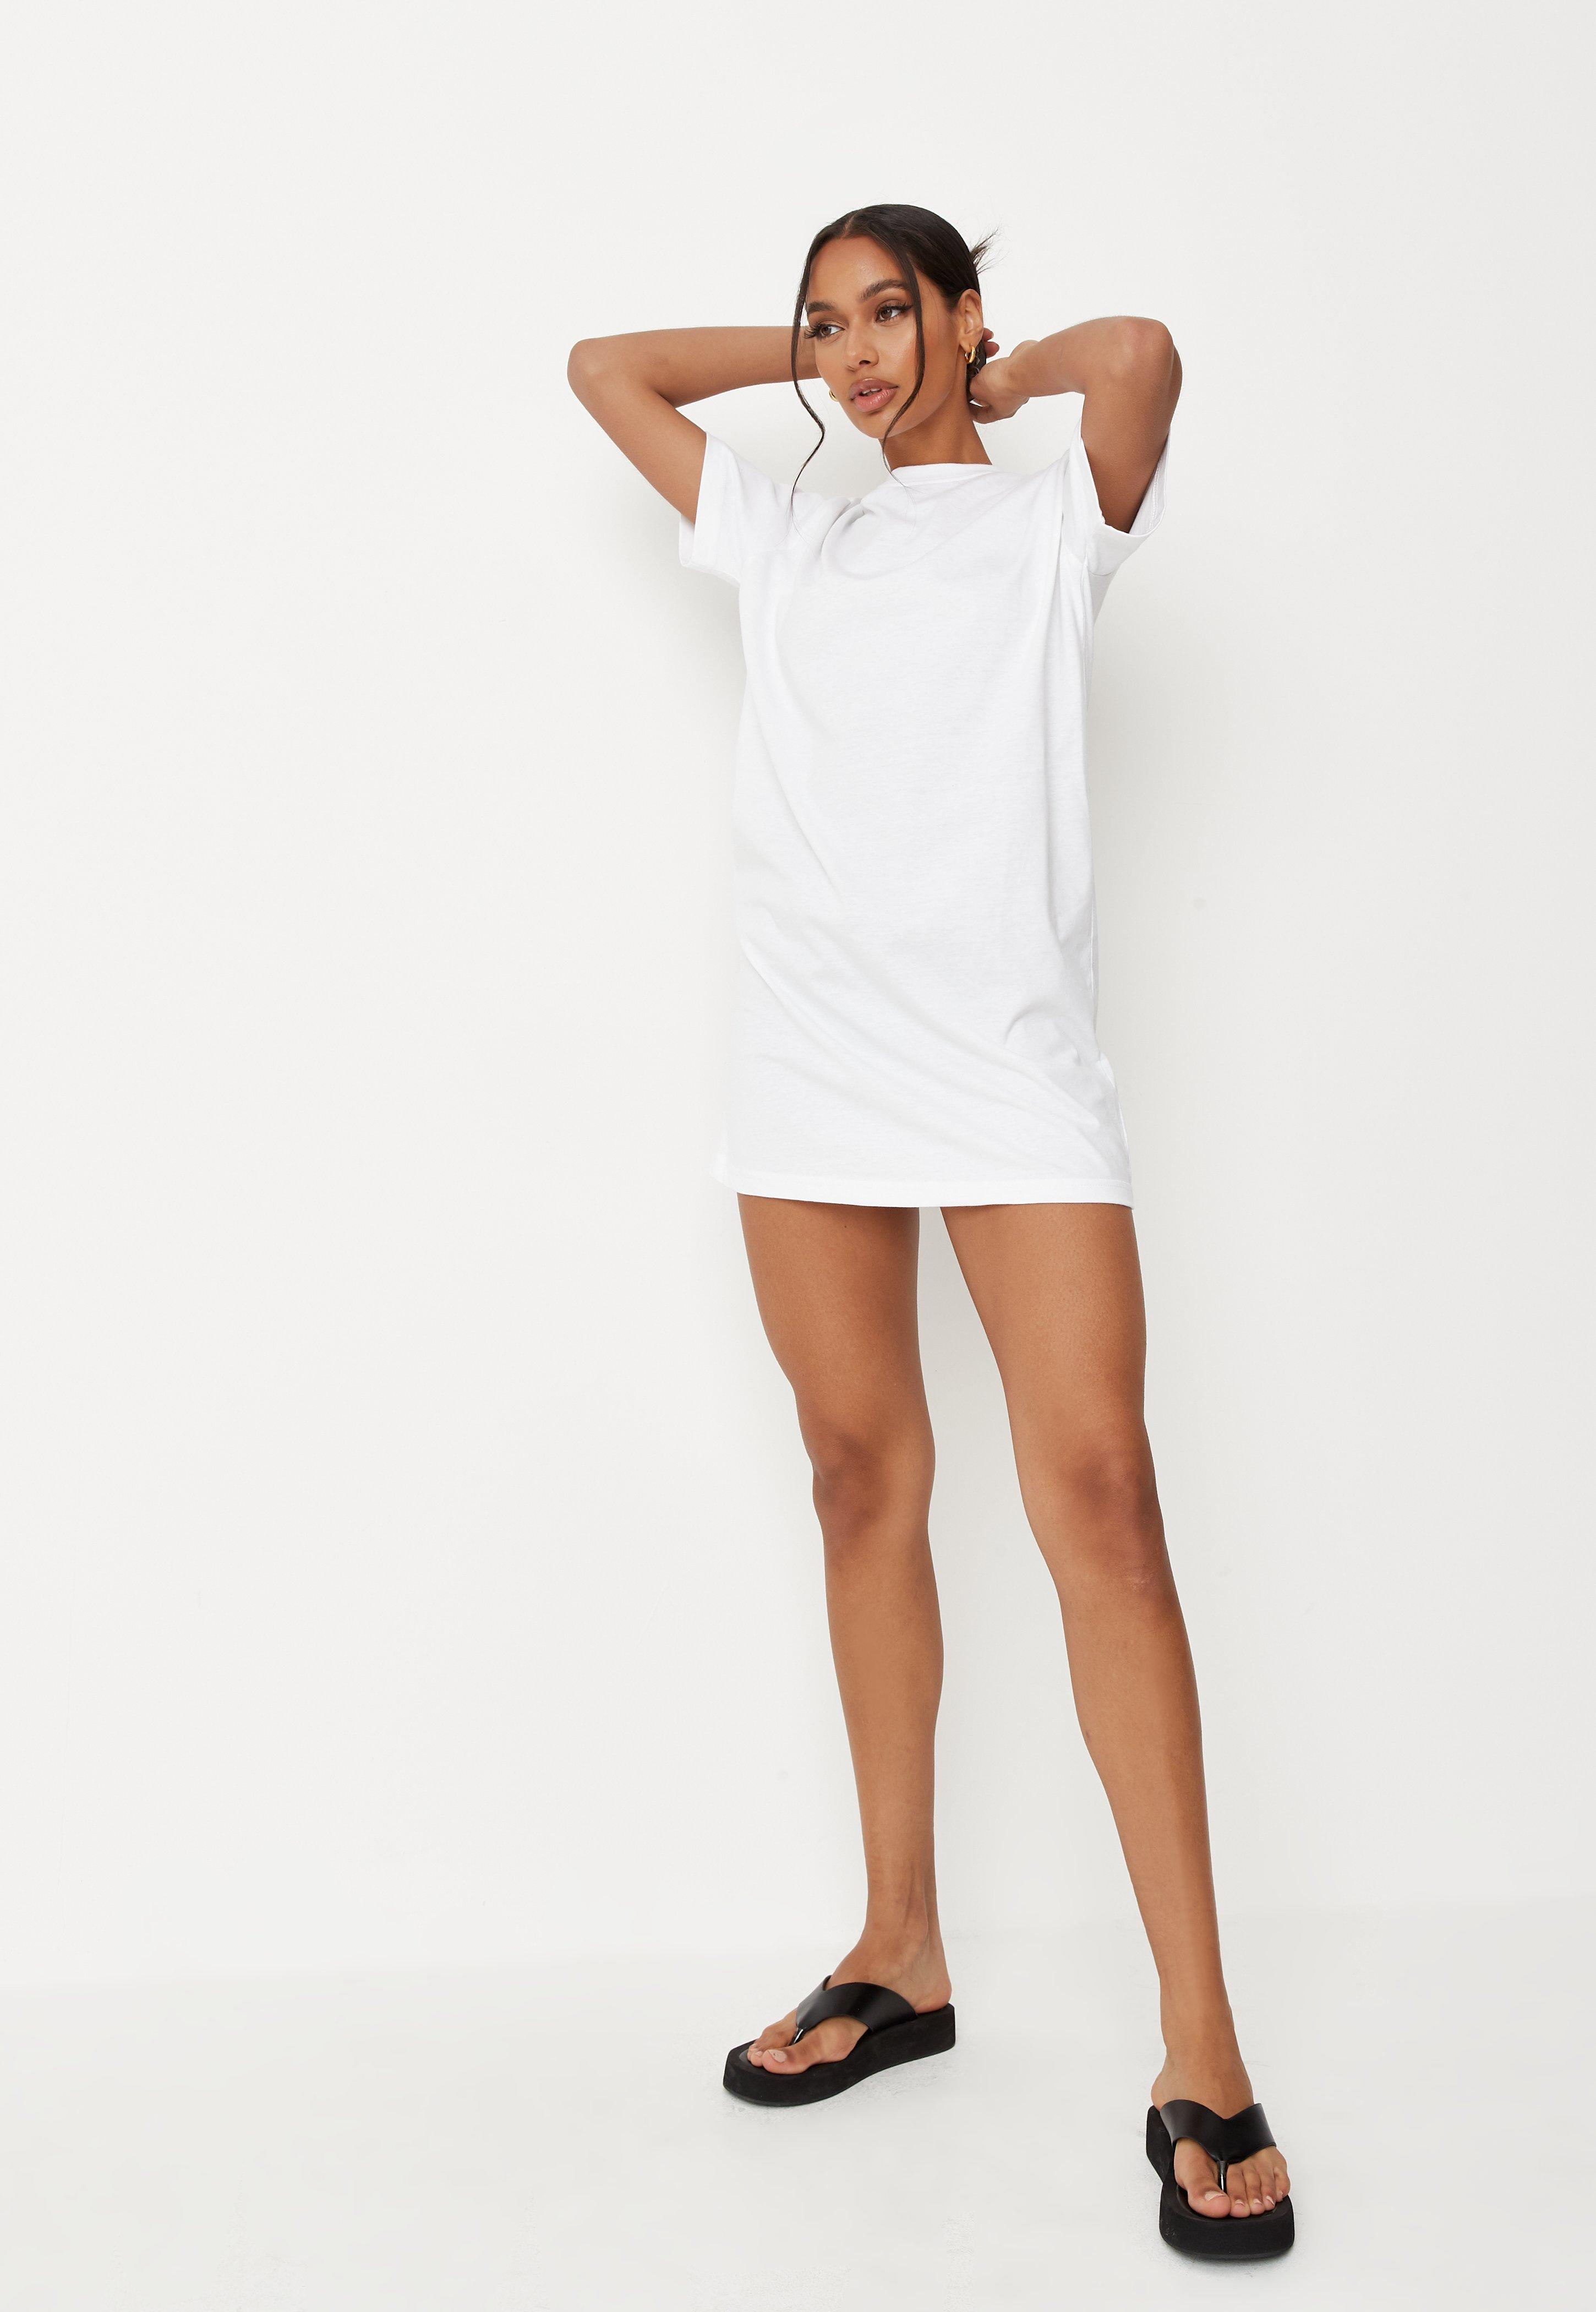 dress white t shirt